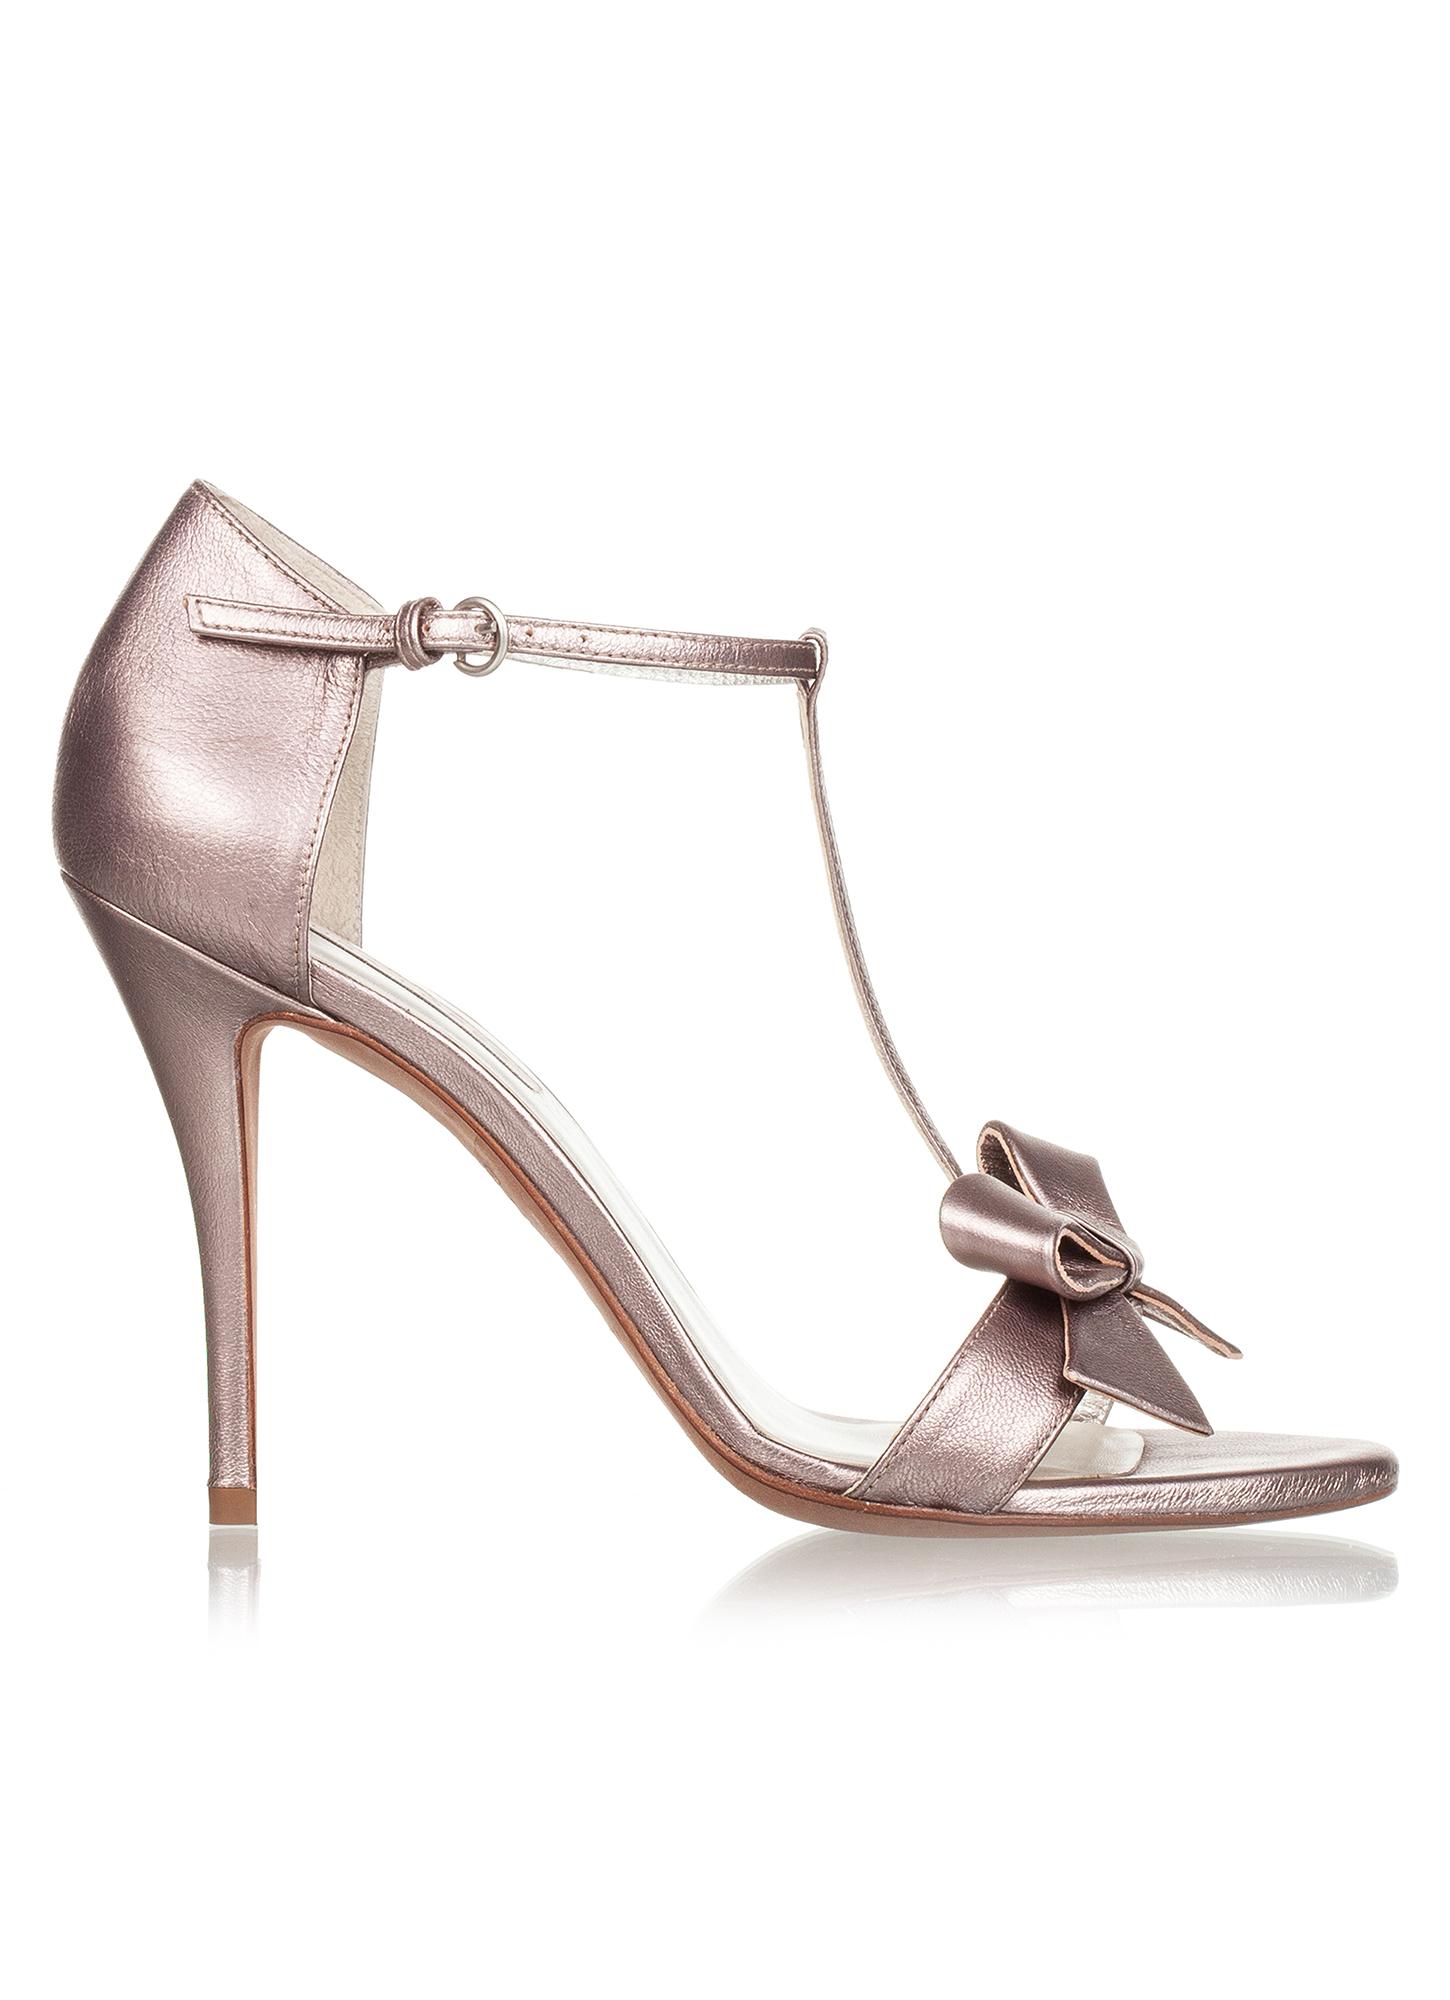 Darla historical Pura López. High heel sandals in metallic leather ...